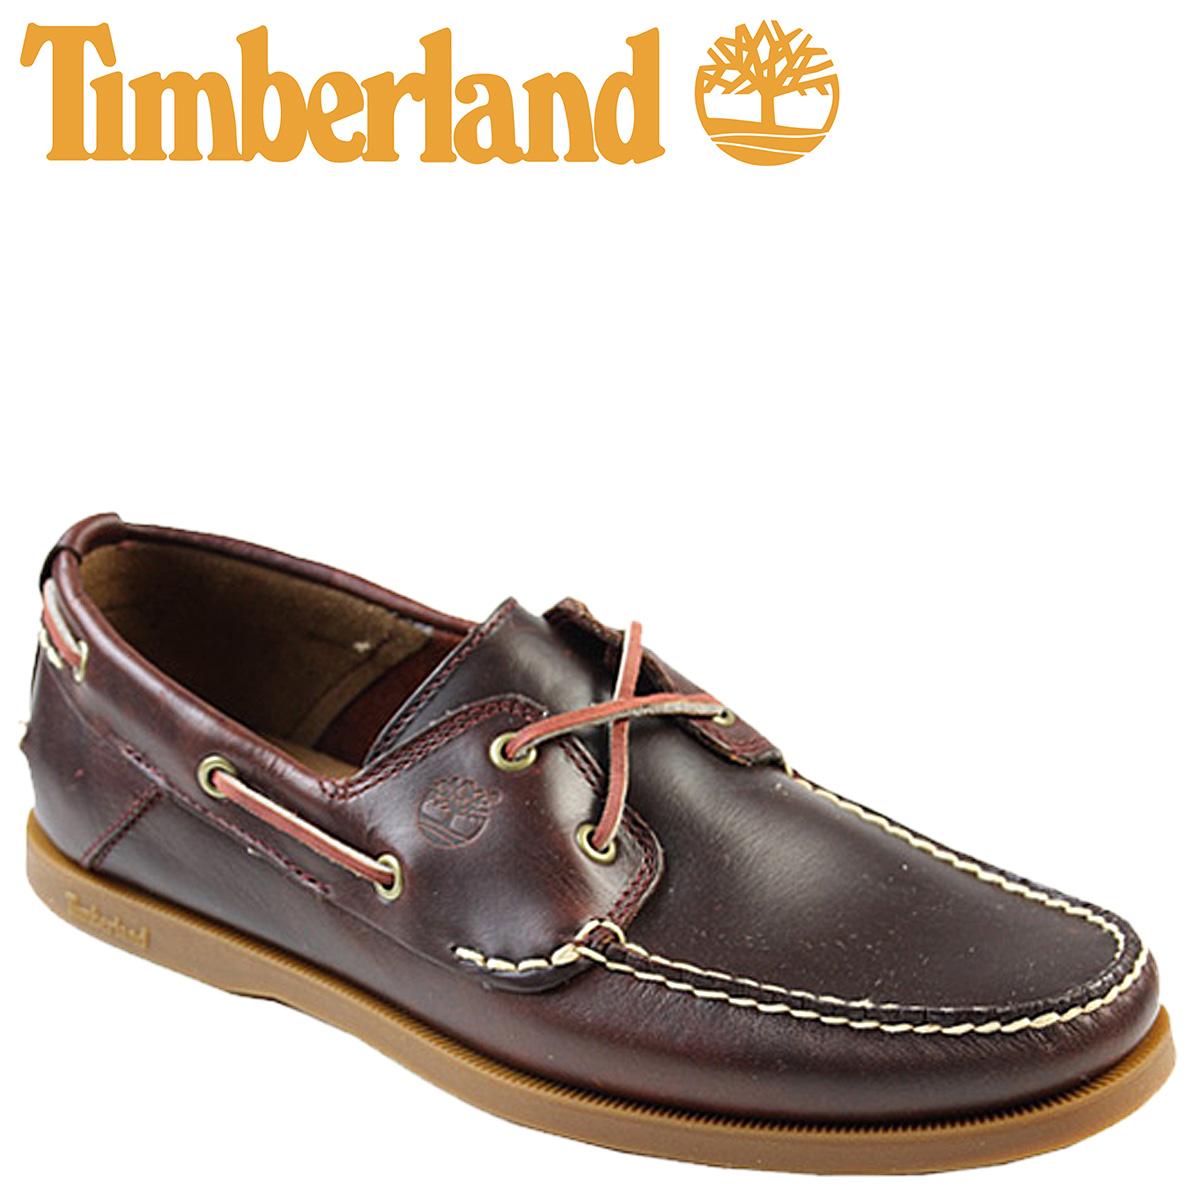 e079ed1f691dc6 Timberland Timberland deck shoes EK HERITAGE 2 EYE BOAT 6363R men ...